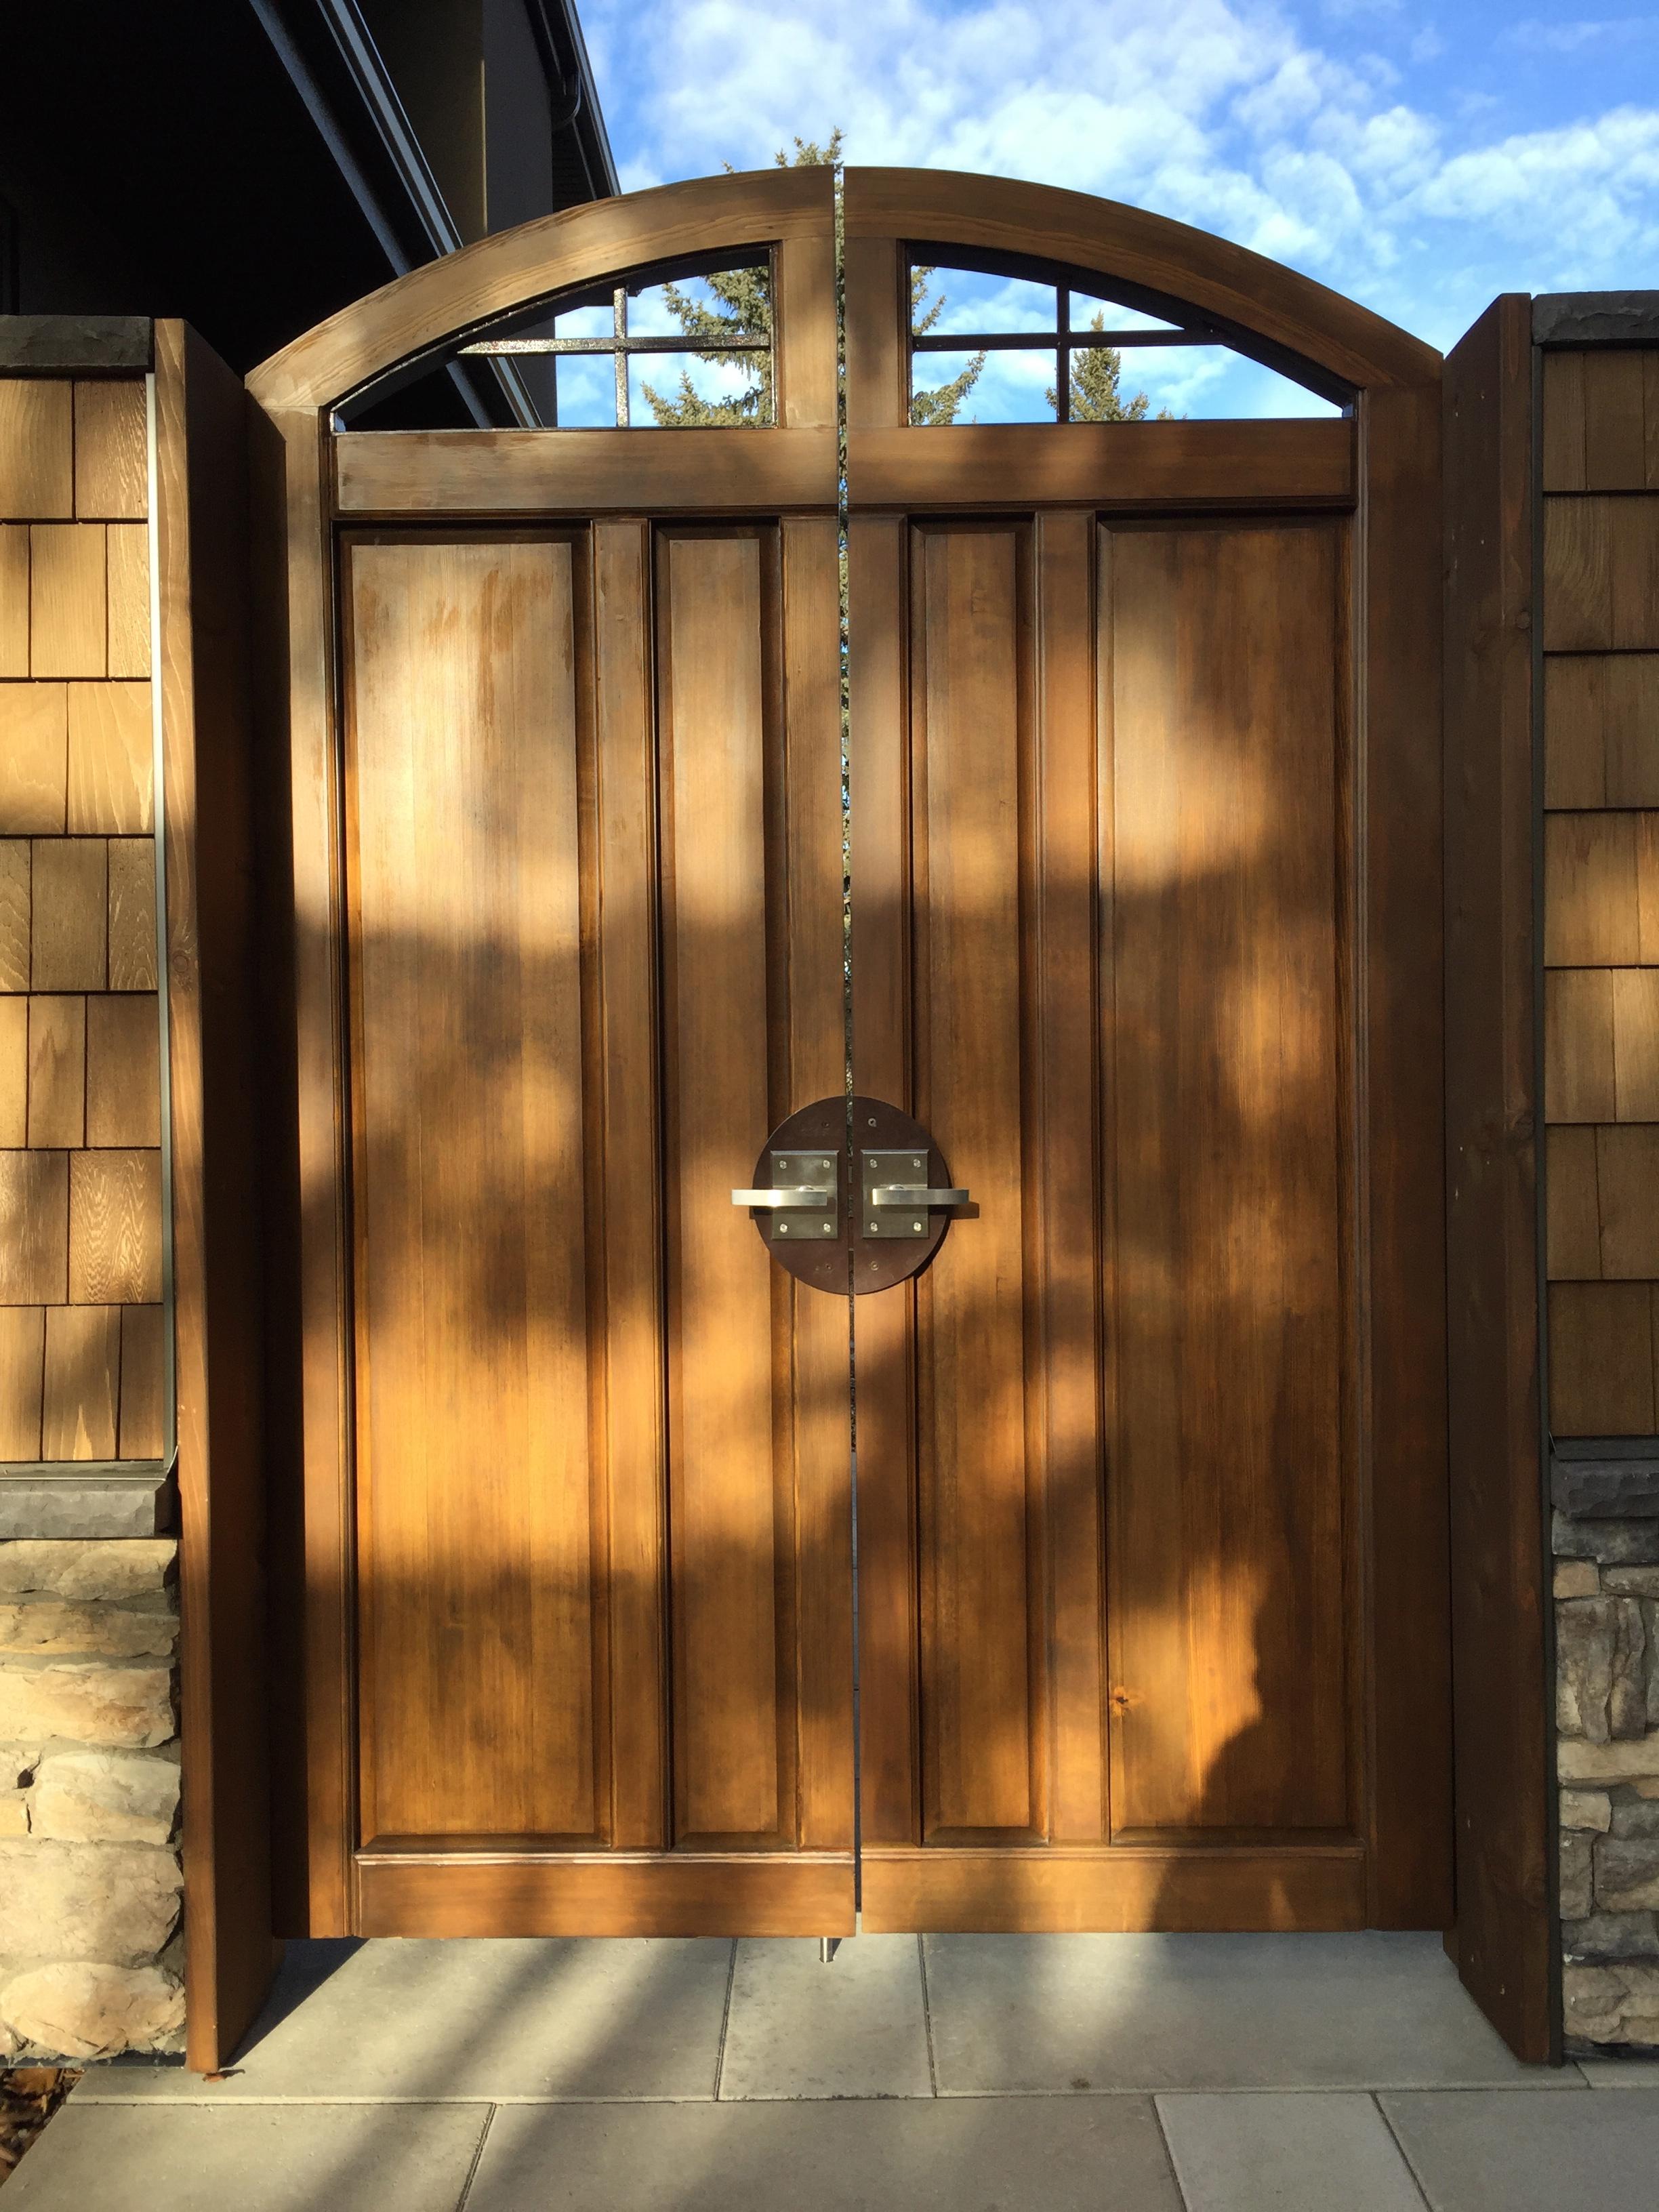 Beautiful Fir wood gate and metal hardware